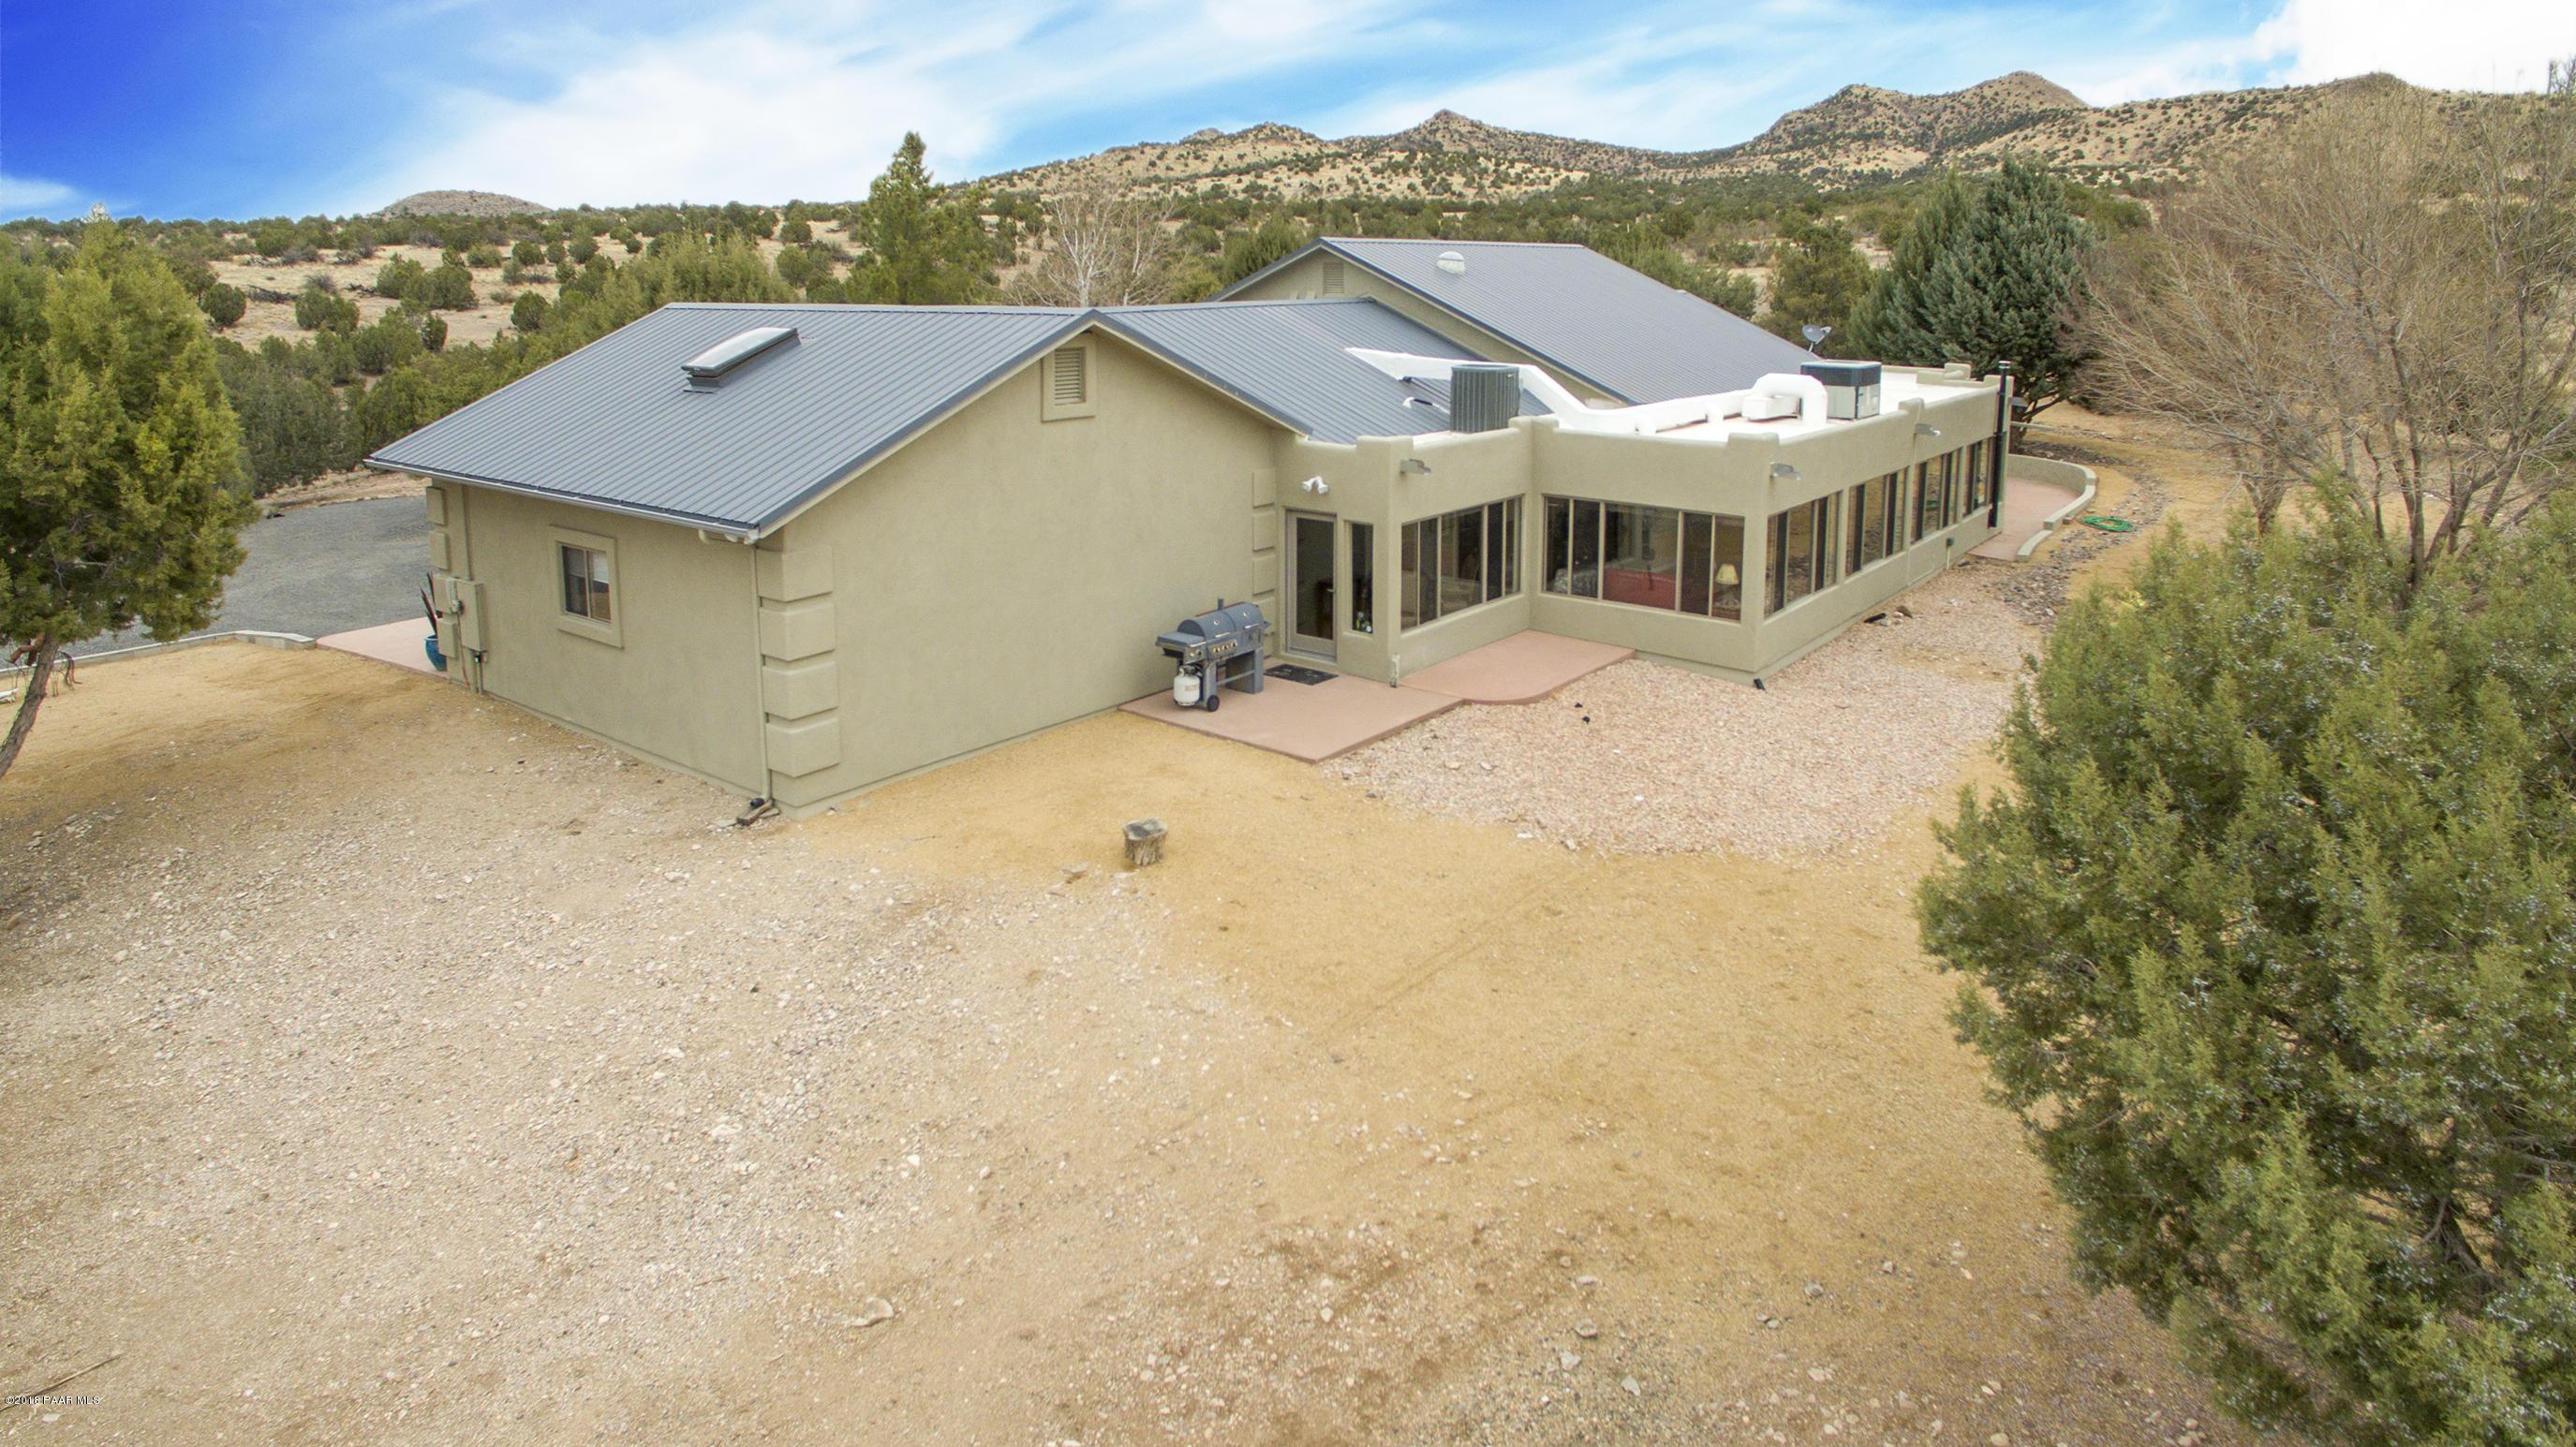 6500 W Rambling Road Prescott, AZ 86305 - MLS #: 1010217